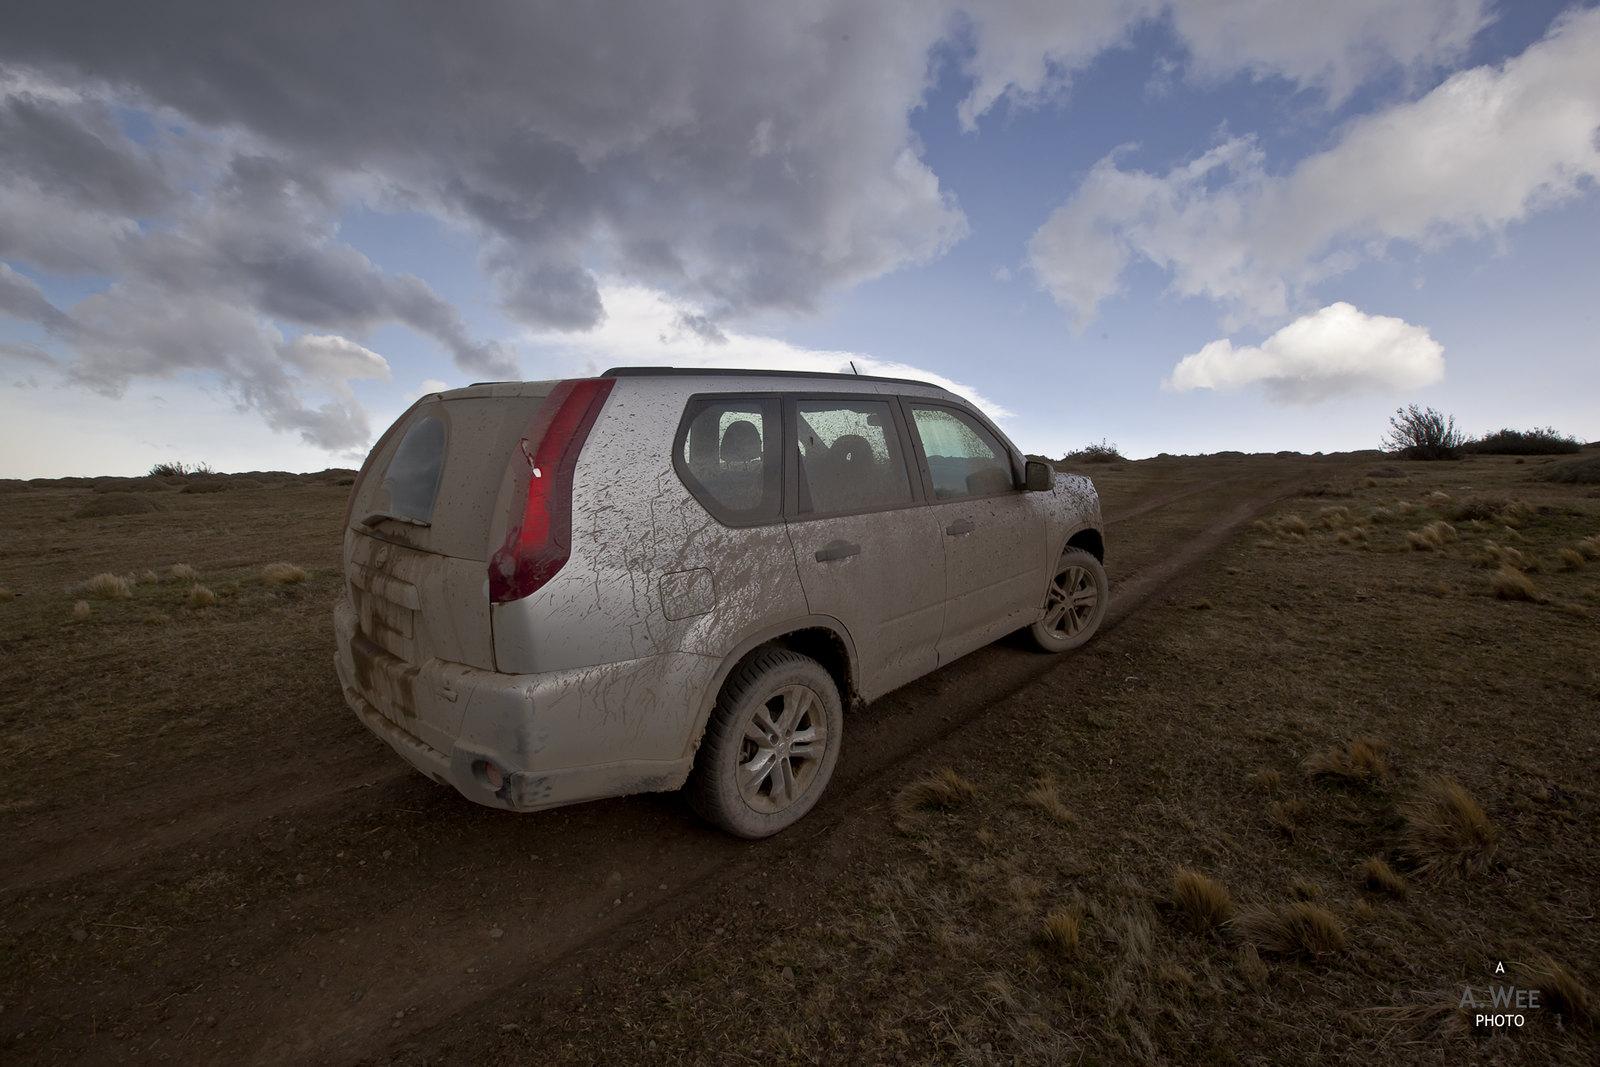 Muddy X-Trail